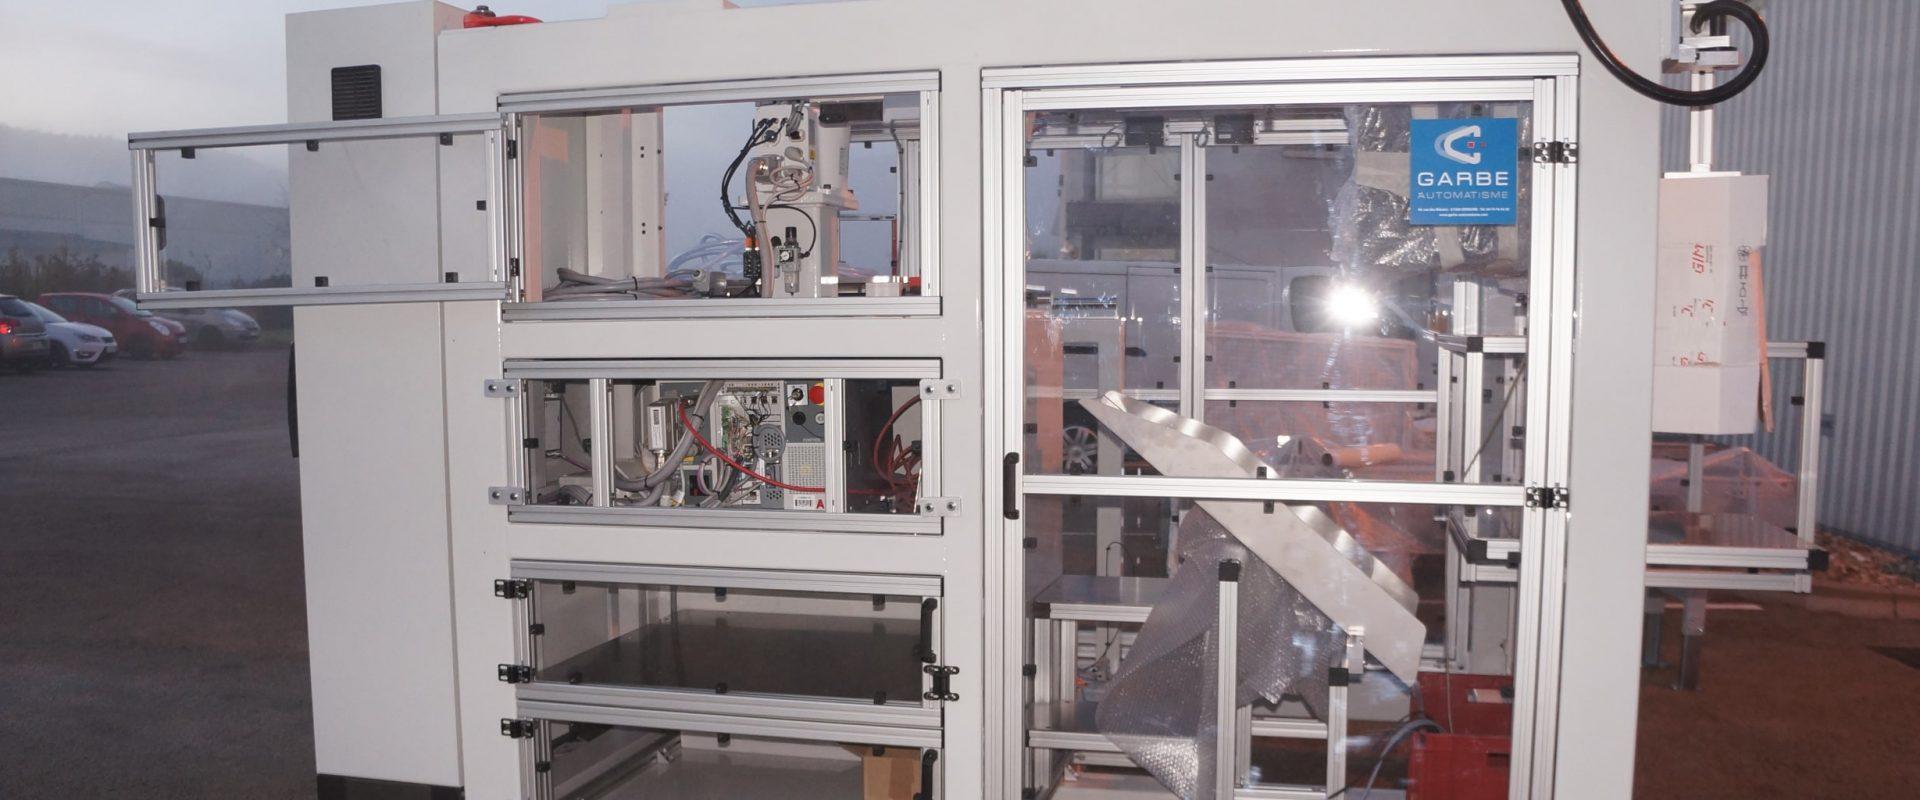 Garbe automatisme - machine - automatisation